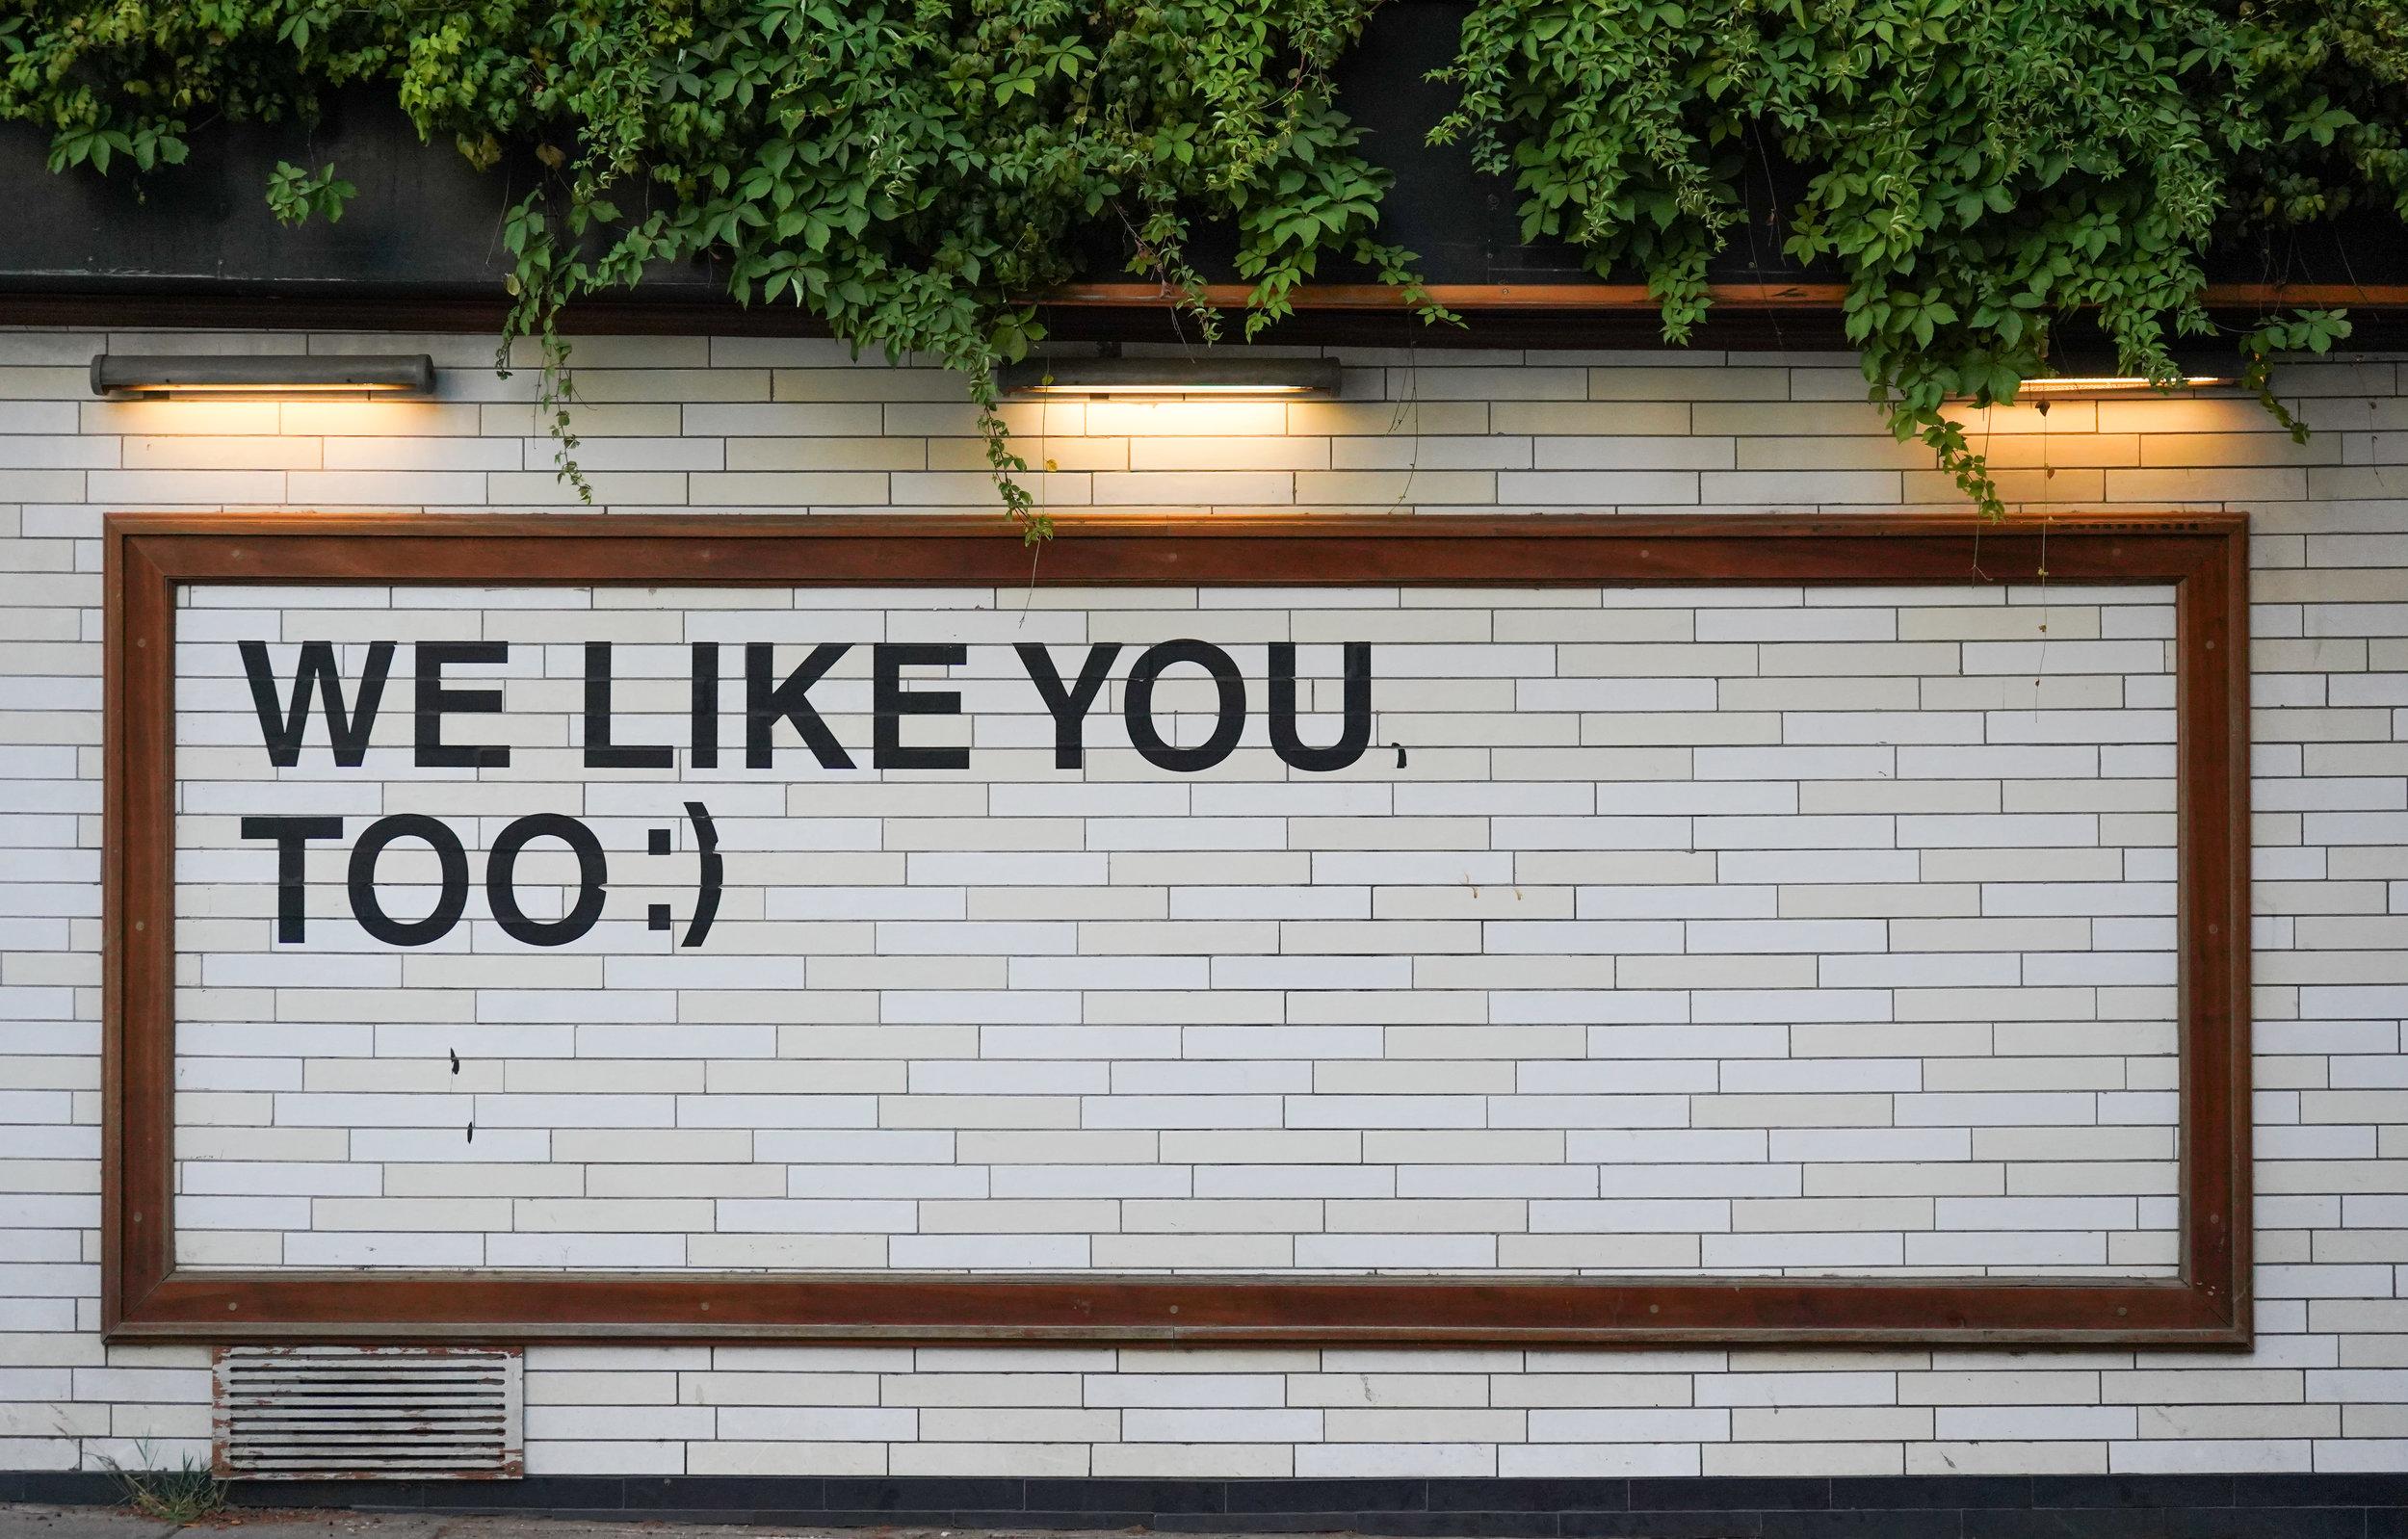 We like you too message